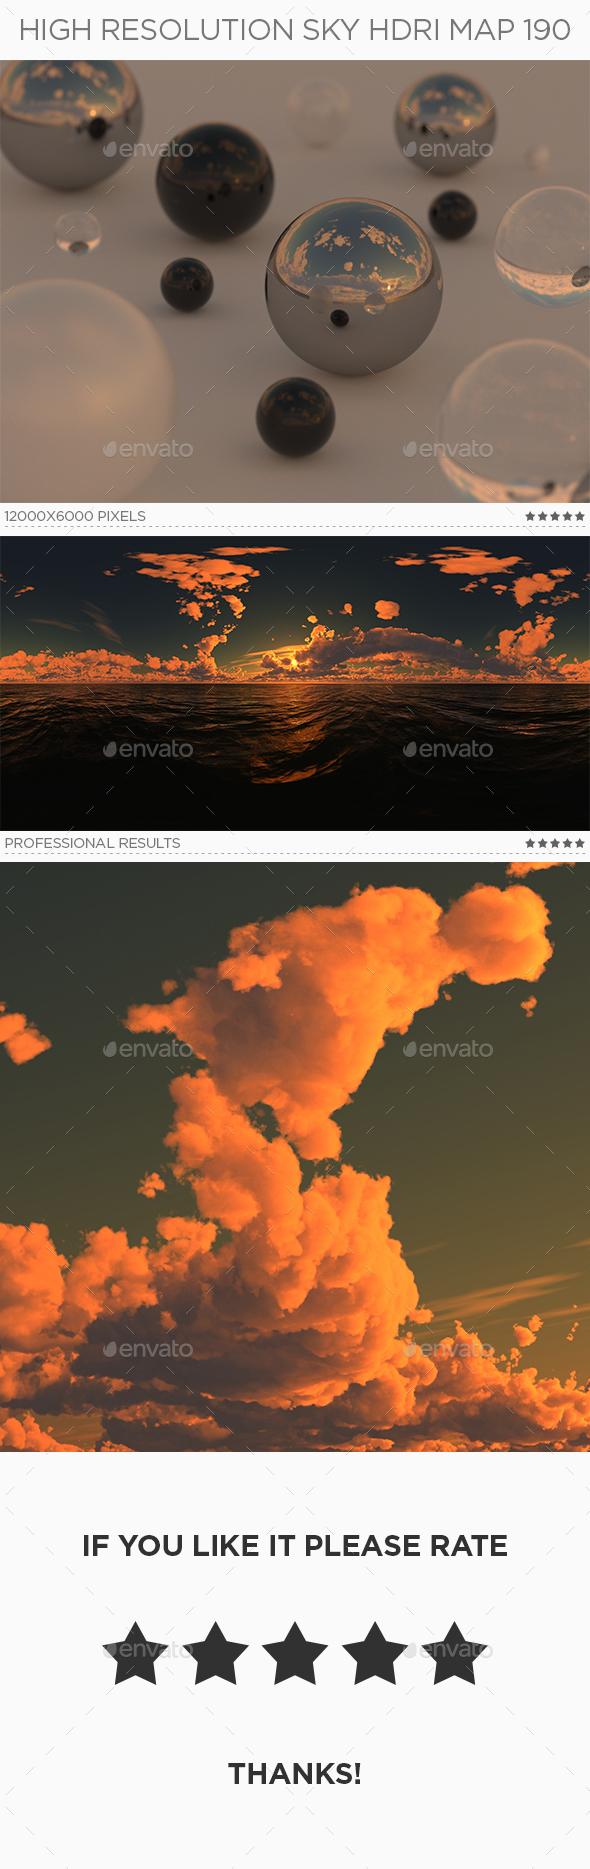 High Resolution Sky HDRi Map 190 - 3DOcean Item for Sale